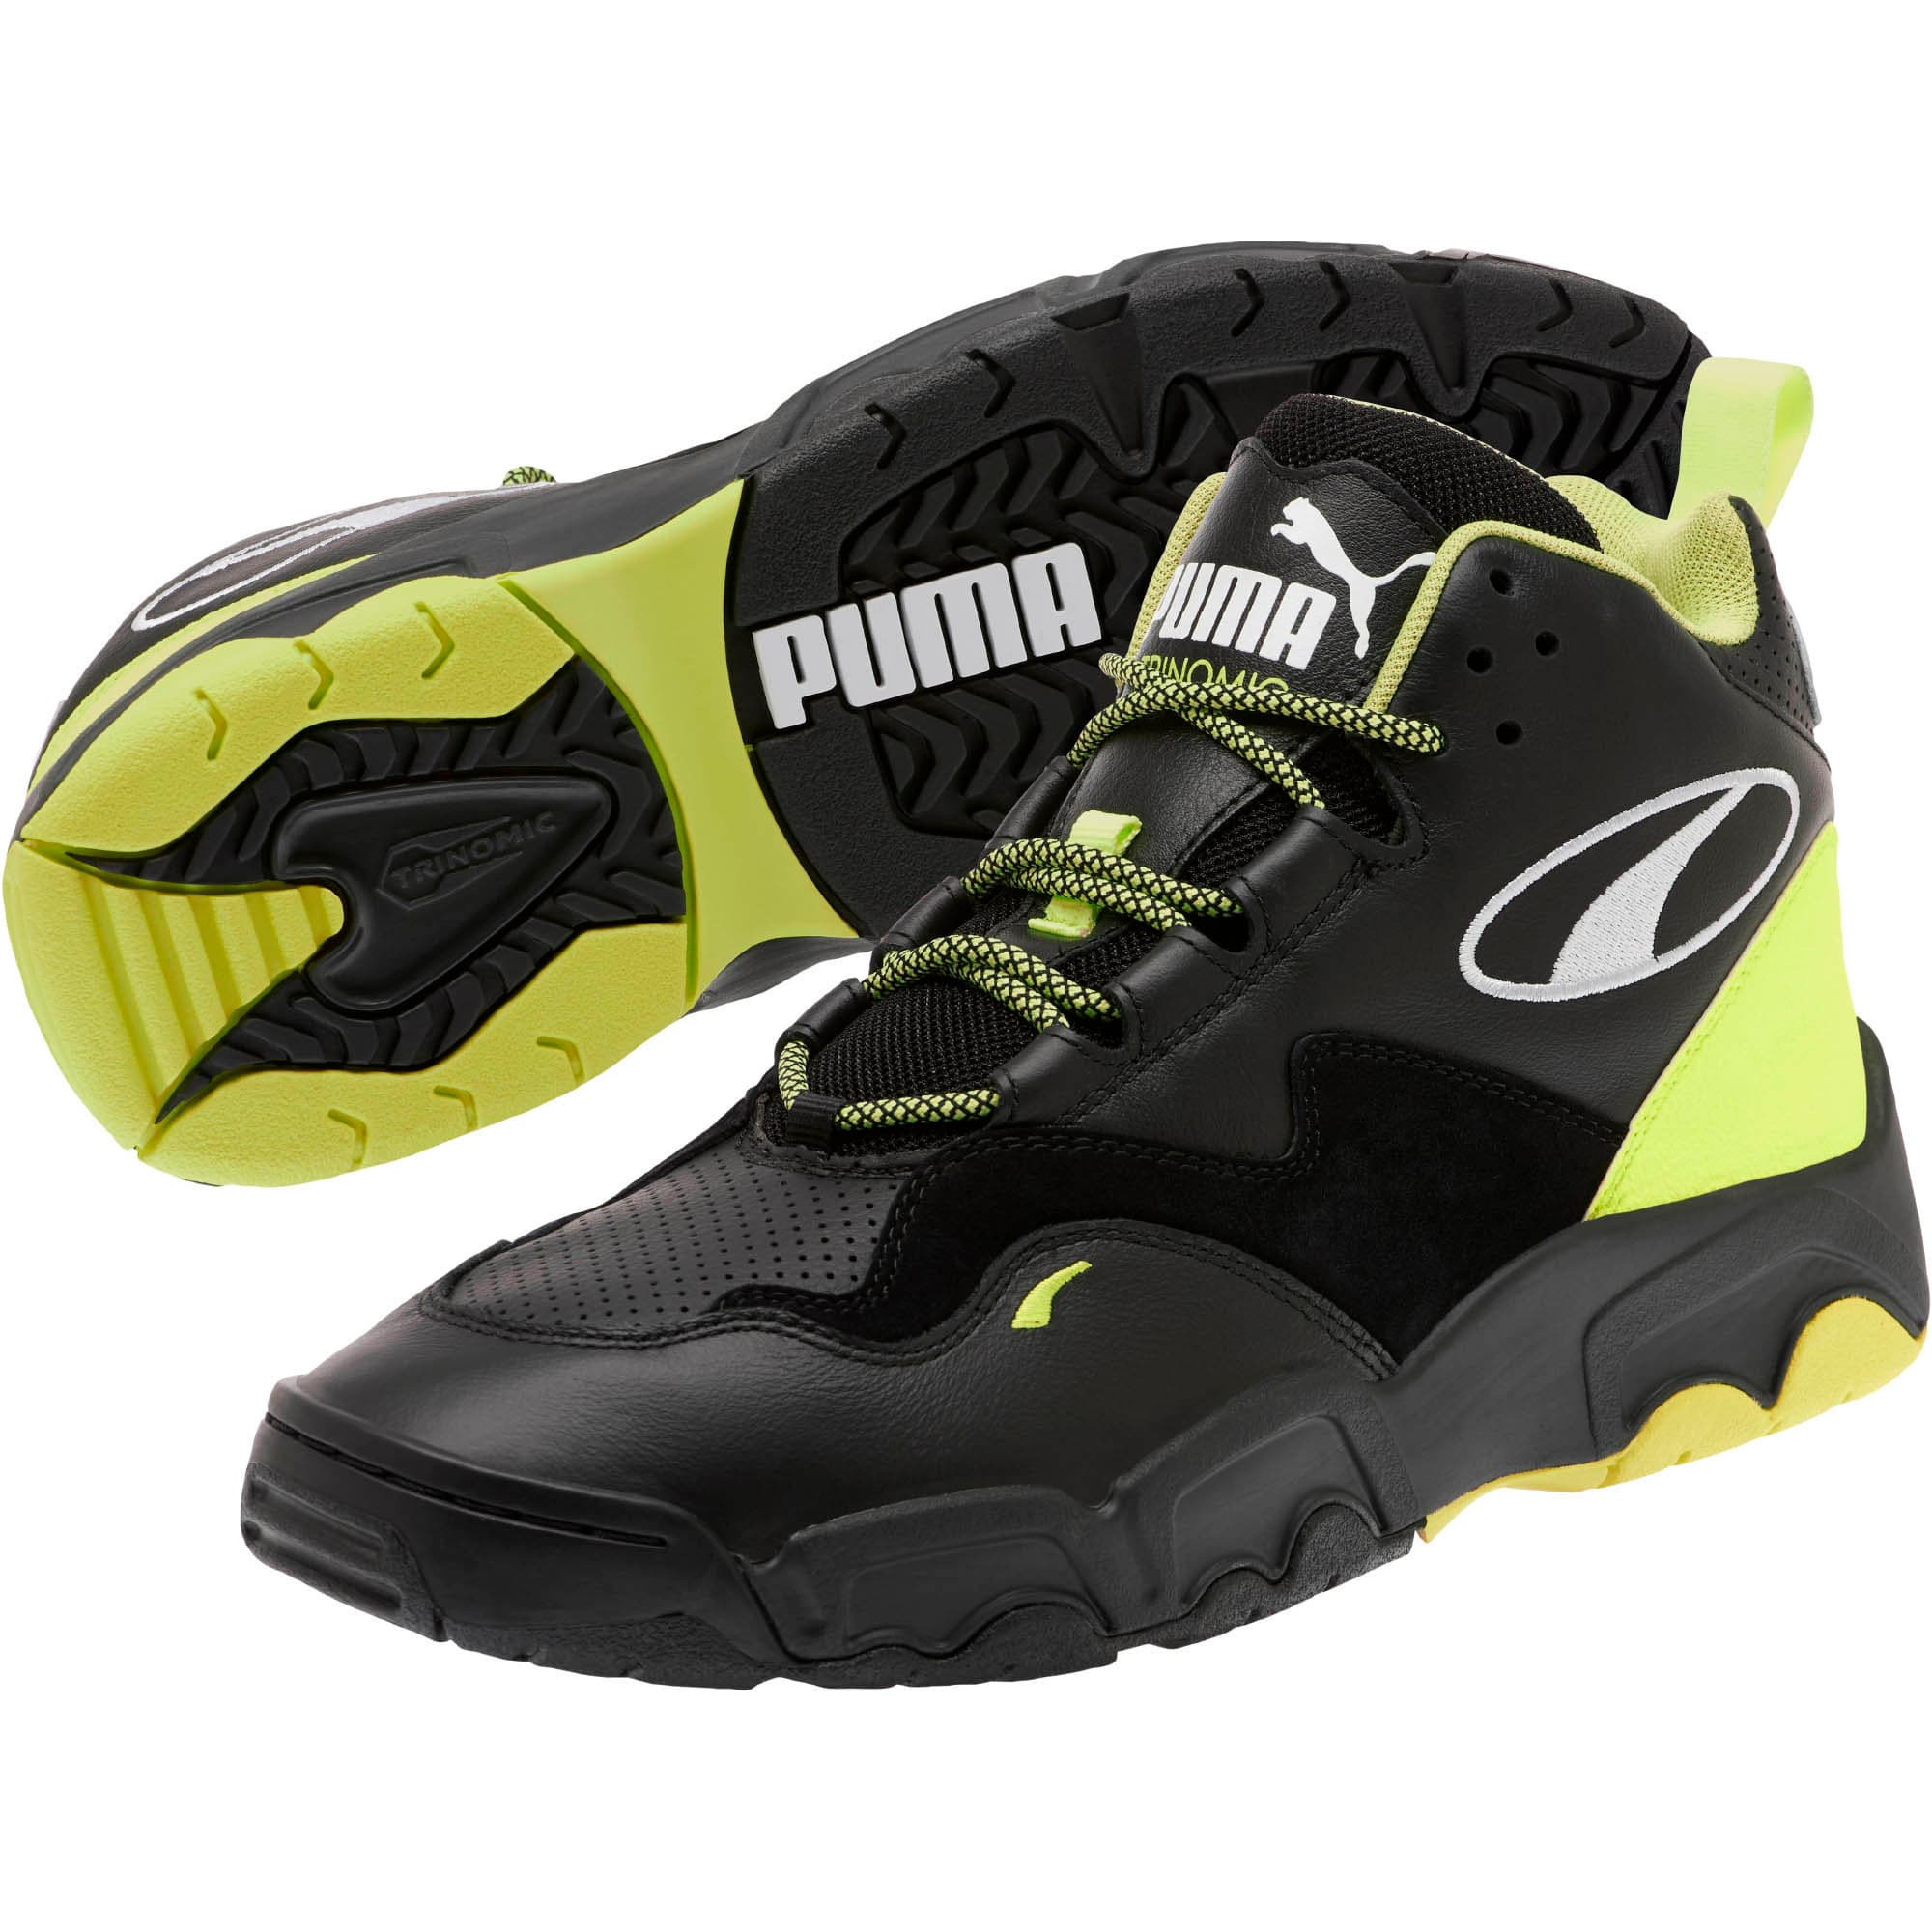 Thumbnail 2 of Source Mid Retro 2 Sneakers, Black-Fizzy Yellow-Pu White, medium